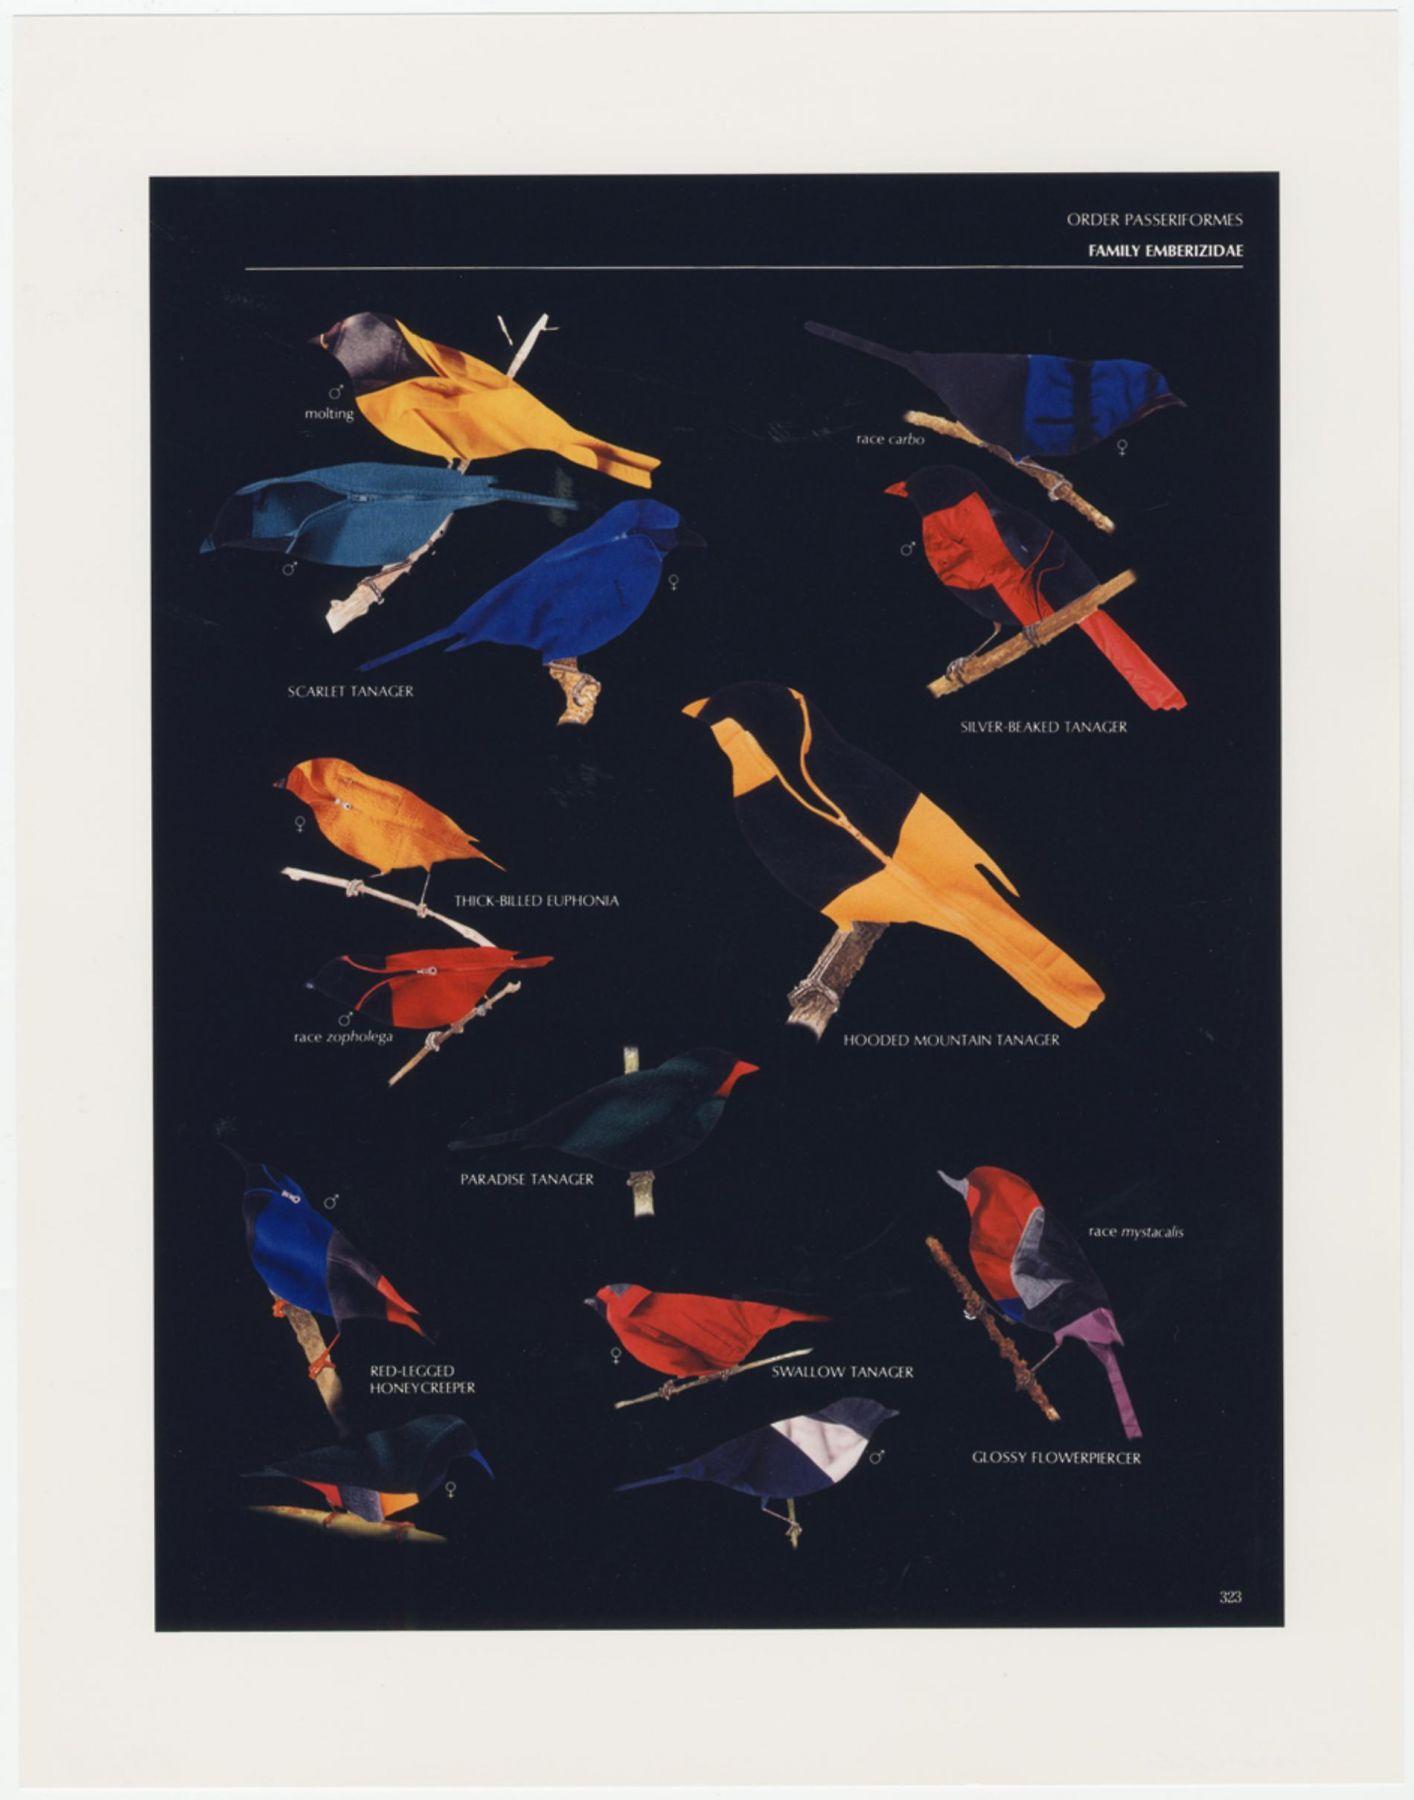 FRED TOMASELLI: Order Passeriformes (Black Version)